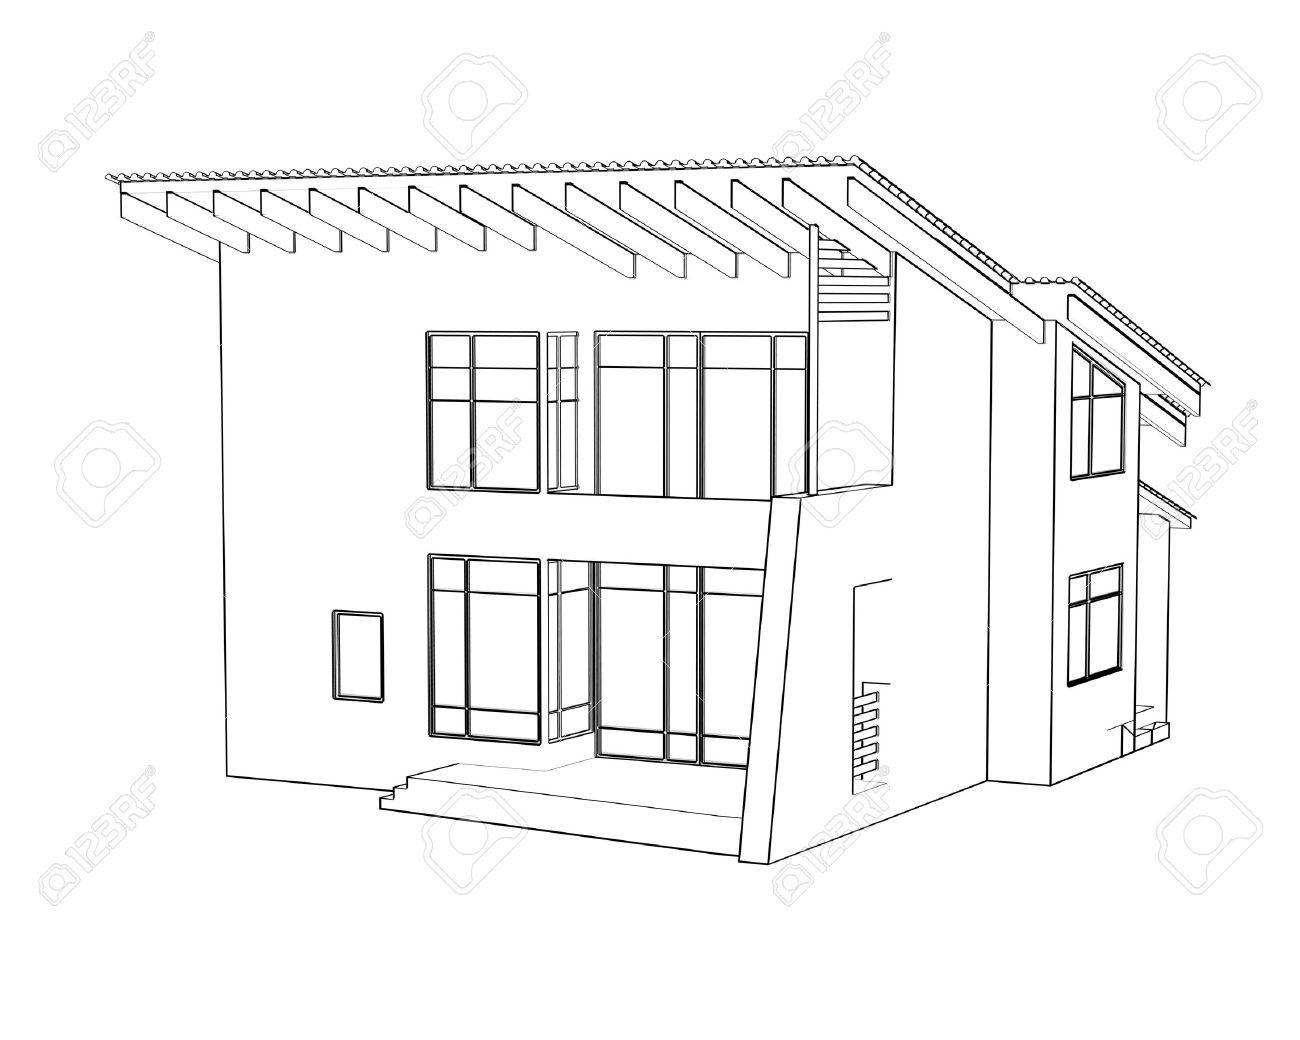 architecture moderne maison dessin - Architecture Moderne Maison Dessin